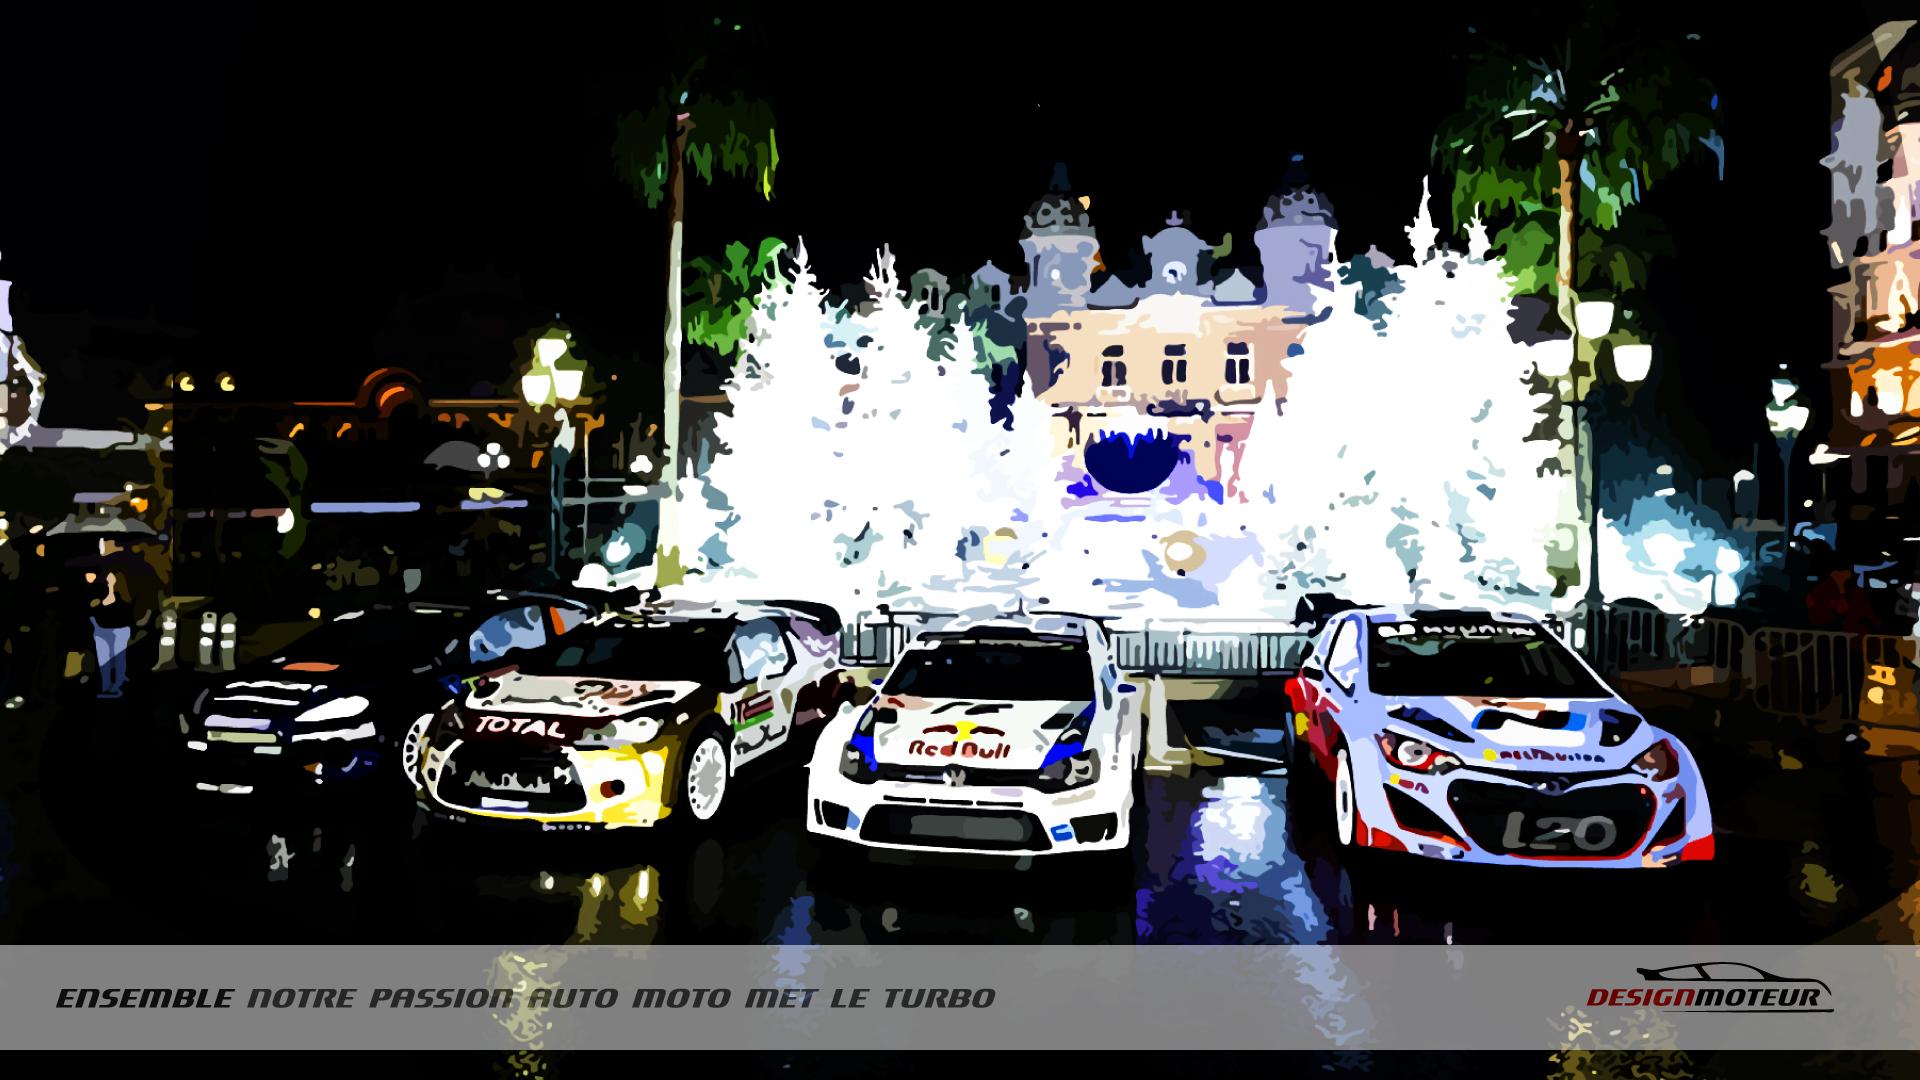 Wallpaper DESIGNMOTEUR 2015 – WRC